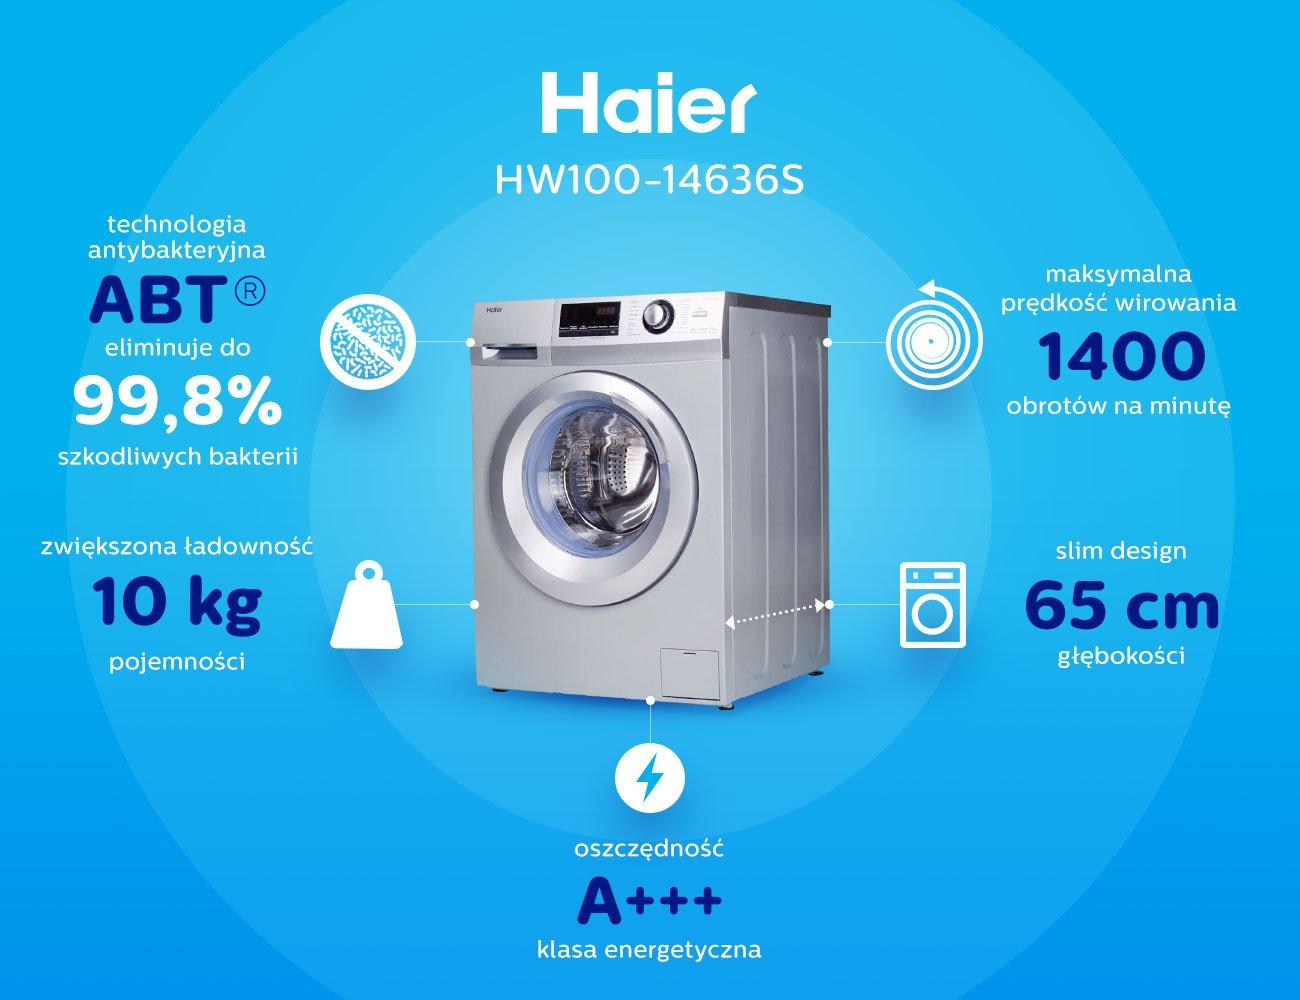 Pralka Haier HW100-14636S